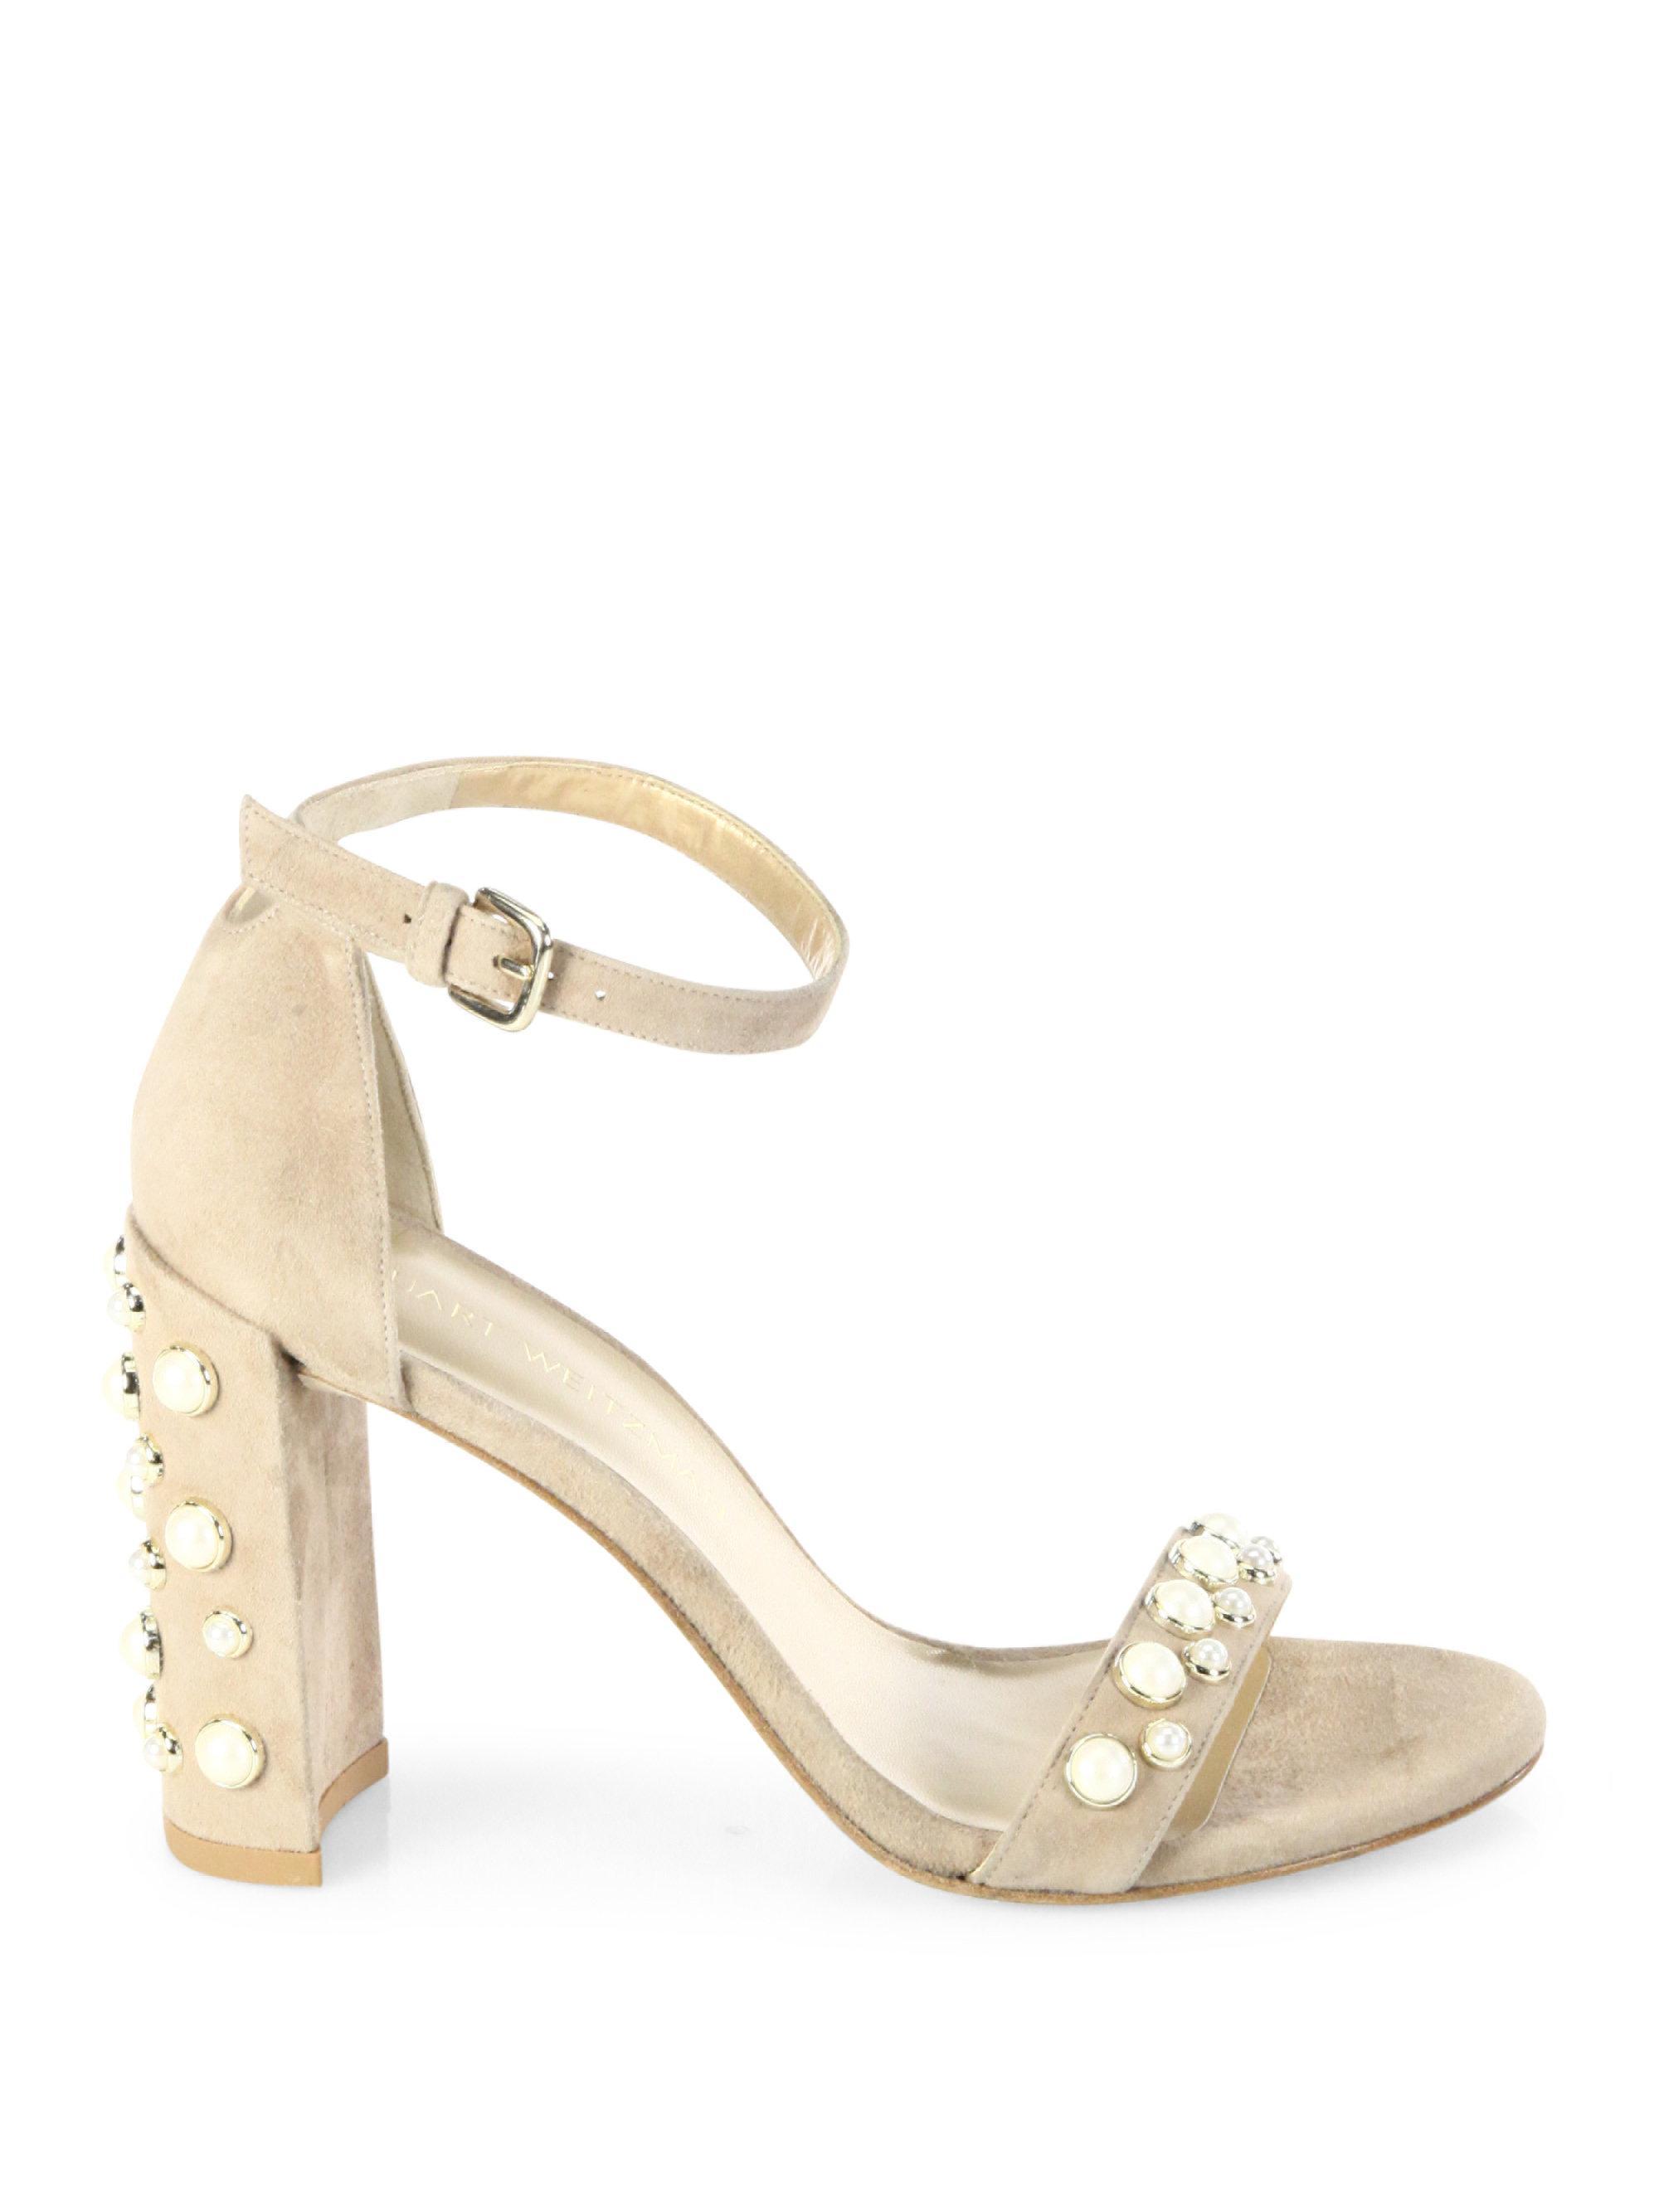 cdb3a9fb2adb Lyst - Stuart Weitzman Morepearls Studded Suede Block Heel Sandals ...